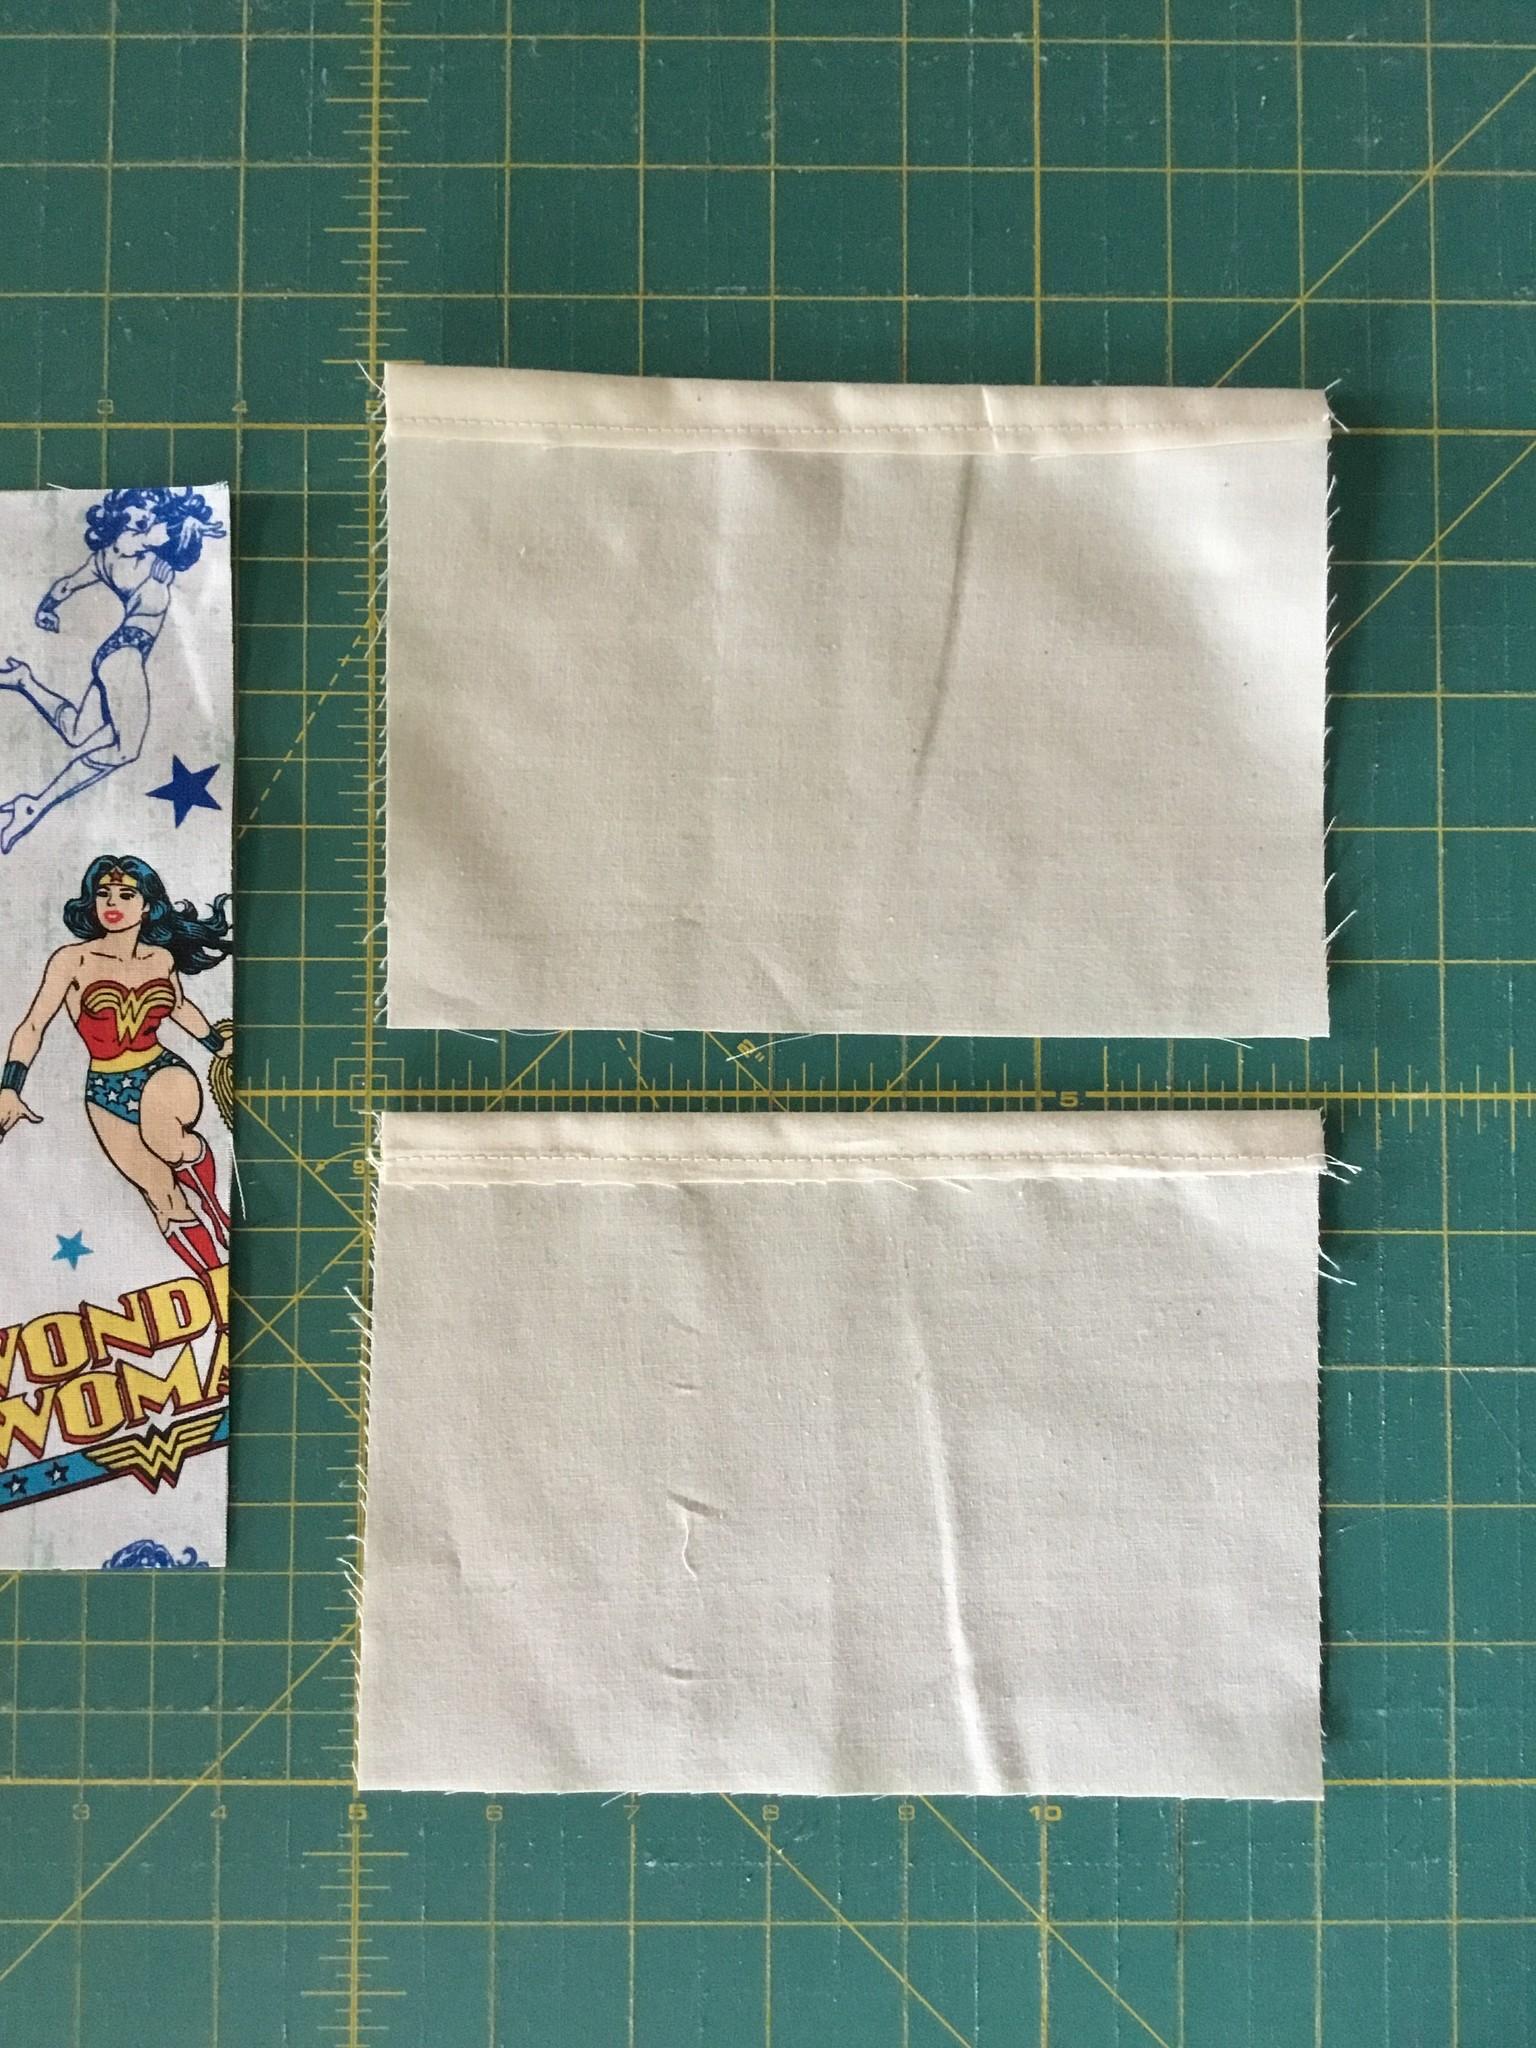 Fabric Mask Lining Folds